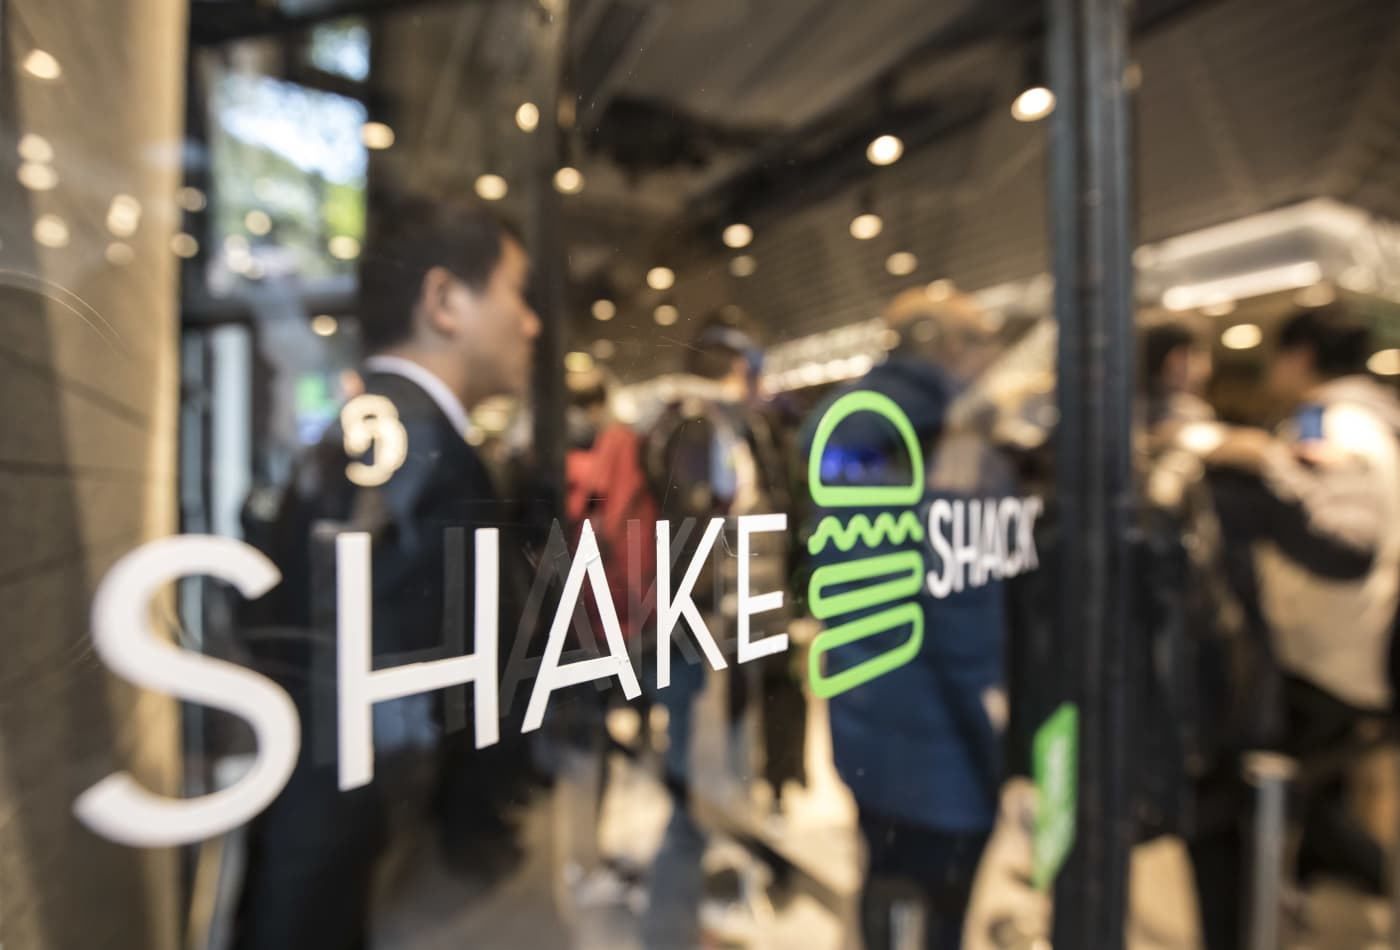 Stocks making the biggest moves midday: Novavax, Shake Shack, Tesla & more